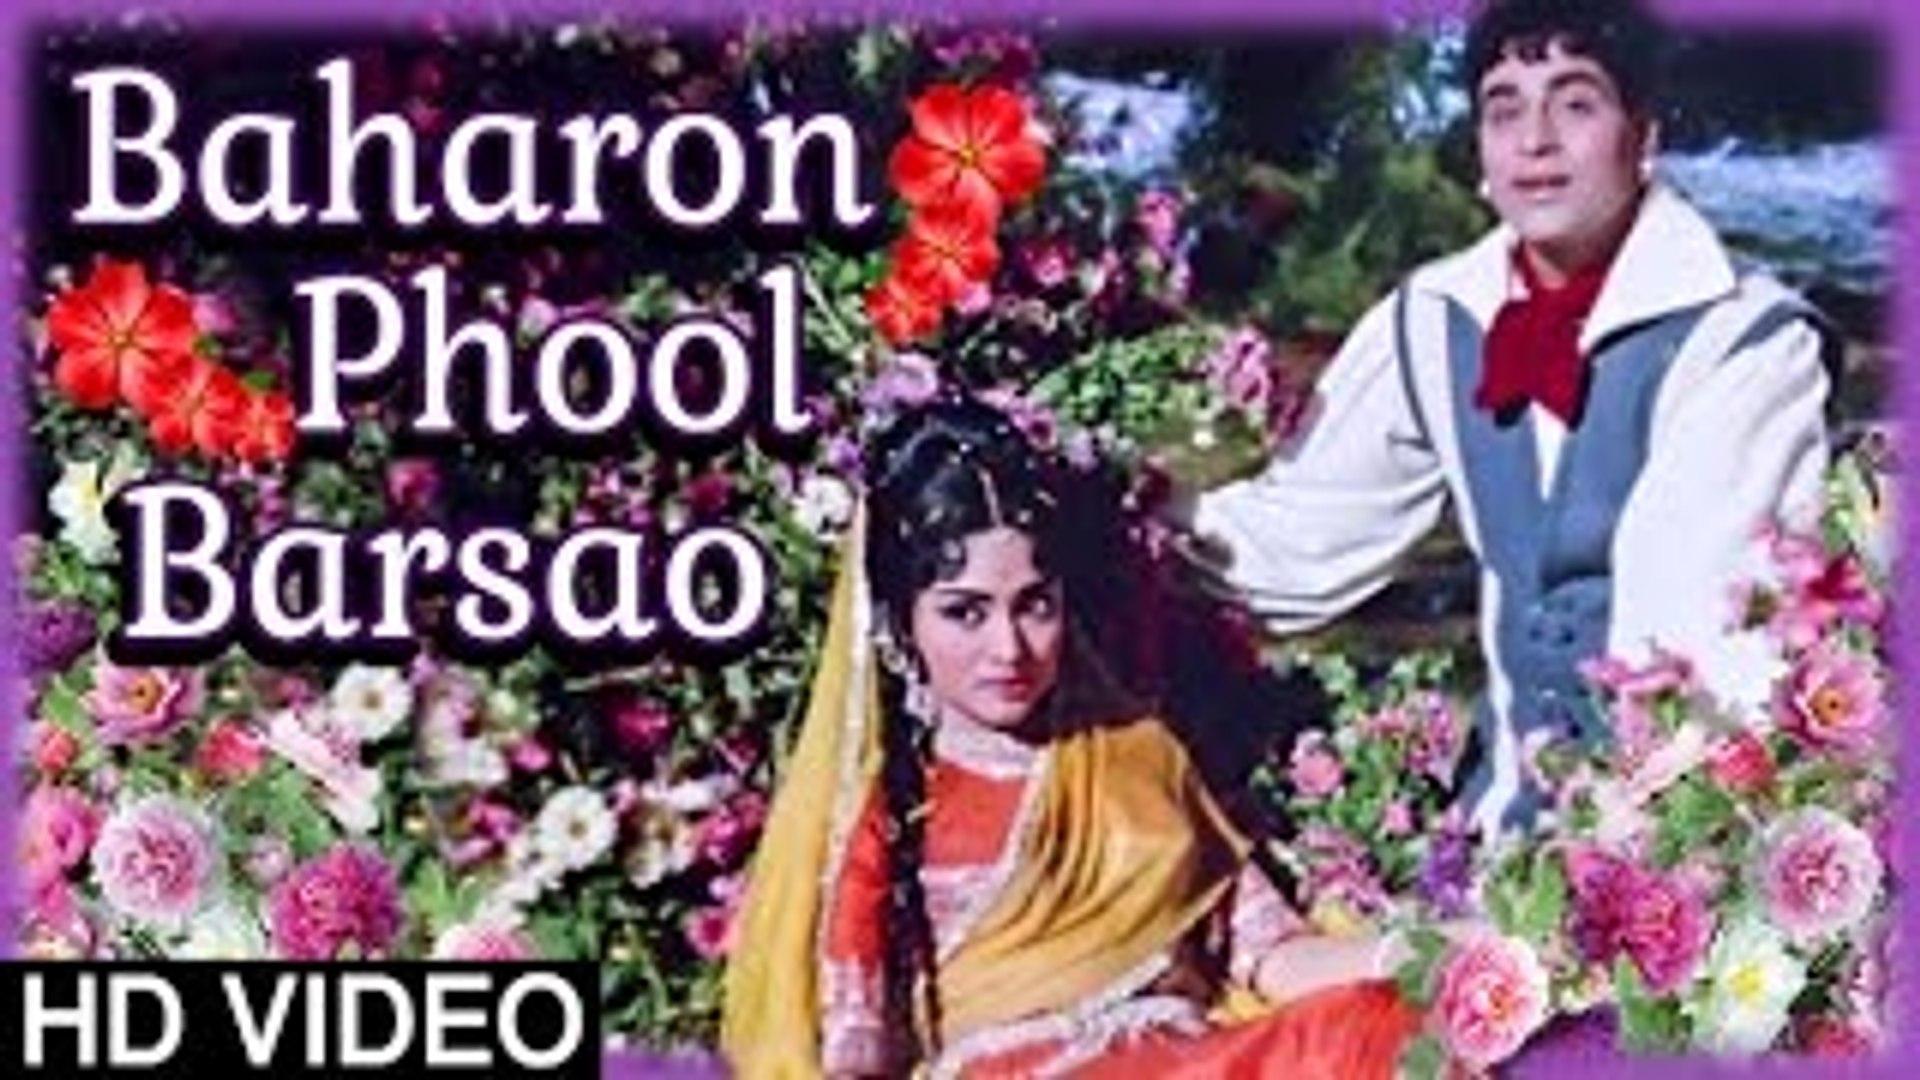 Baharon Phool Barsao Full Song (HD) | Suraj Songs 1966 | Mohammed Rafi  Songs | Shankar Jaikishan Hit